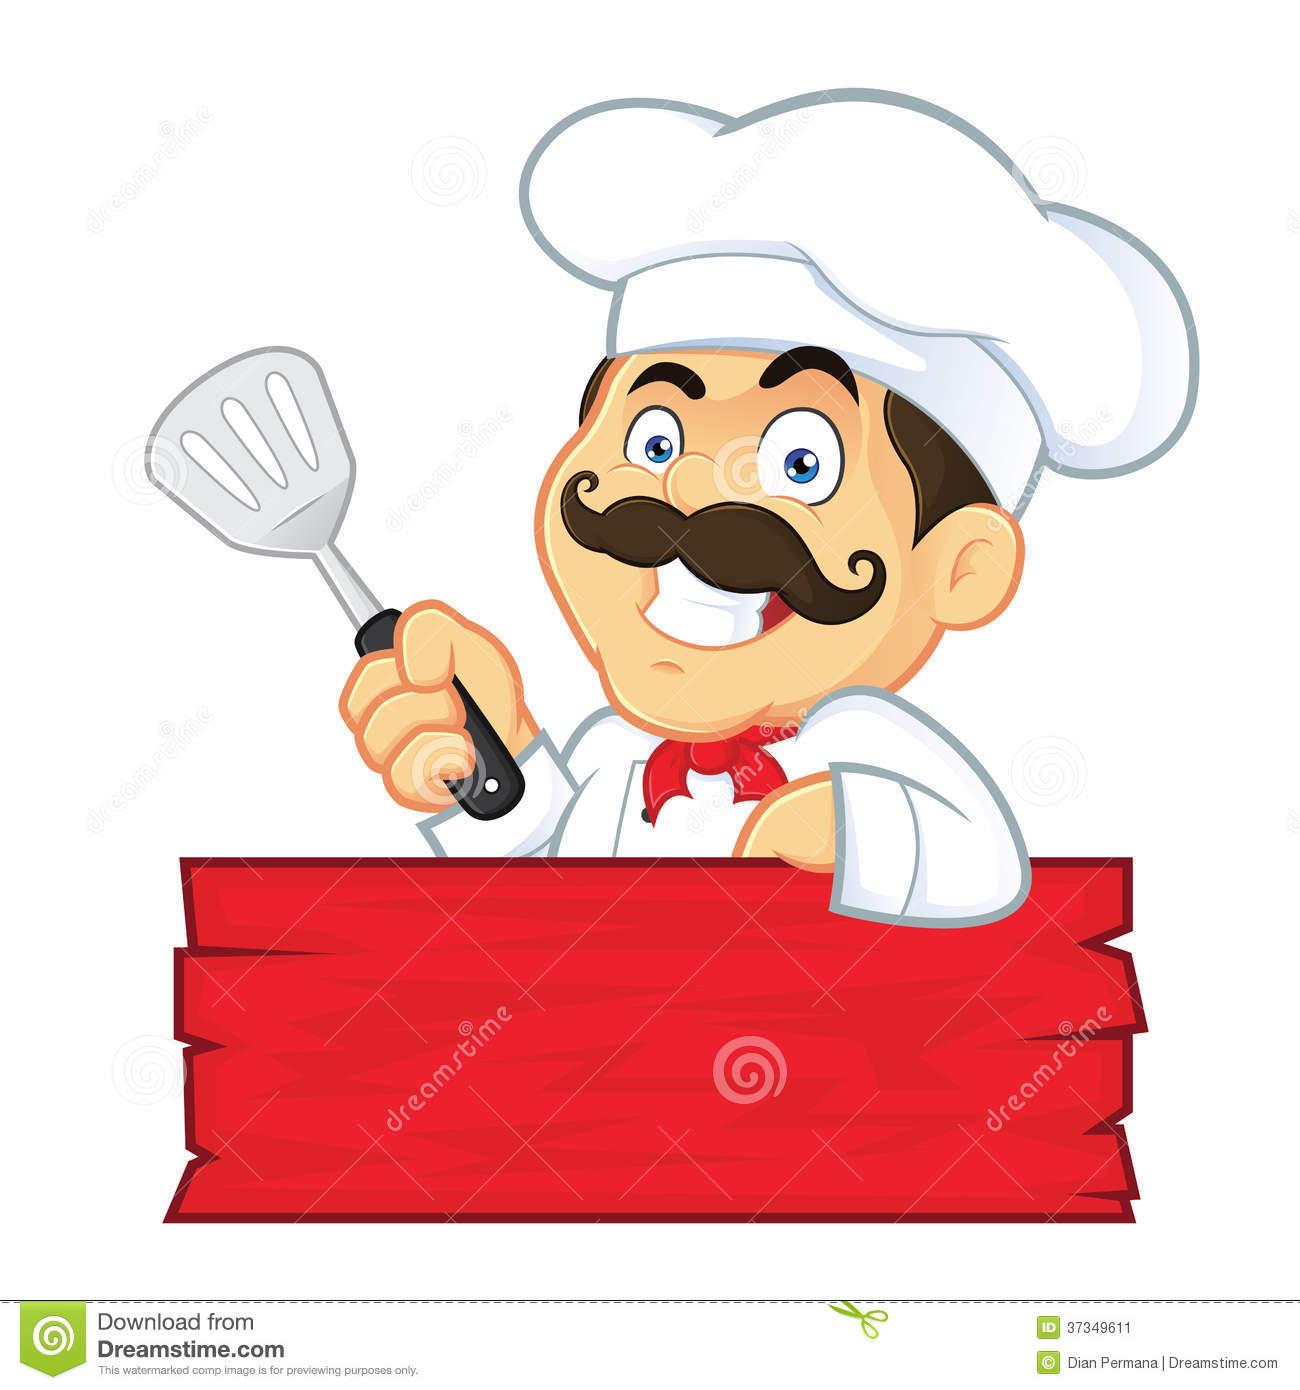 Clipart Picture Of A Chef .-Clipart Picture Of A Chef .-12